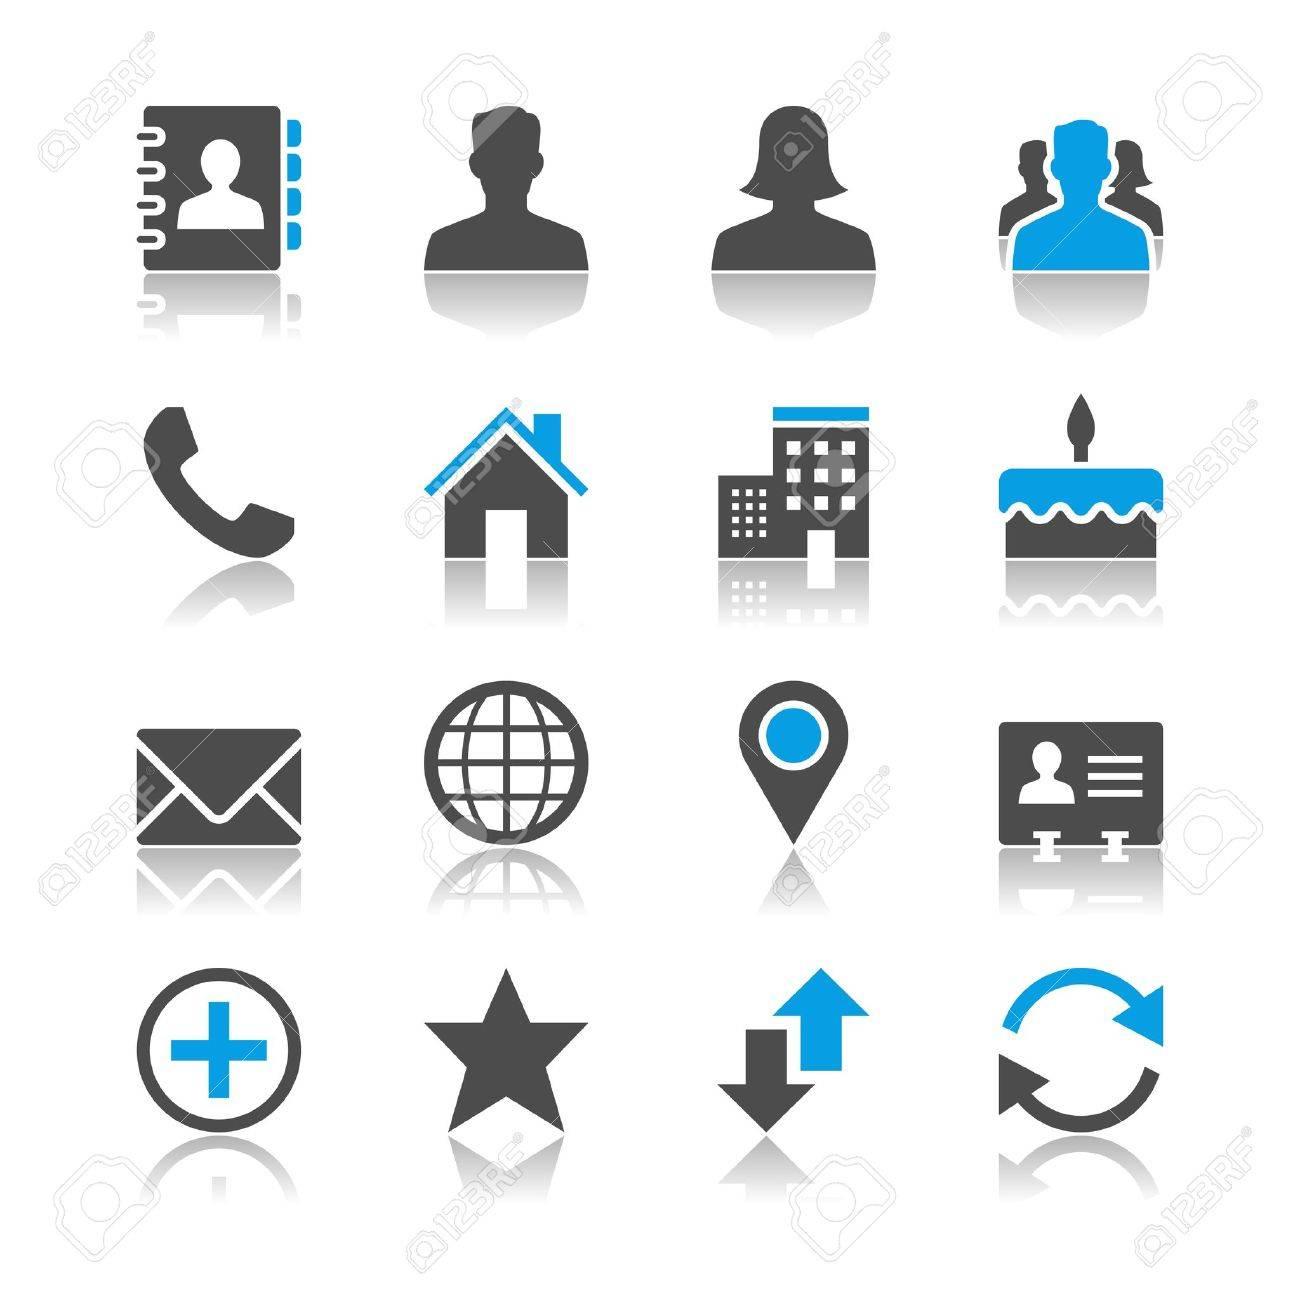 Contact icons - reflection theme - 18915389